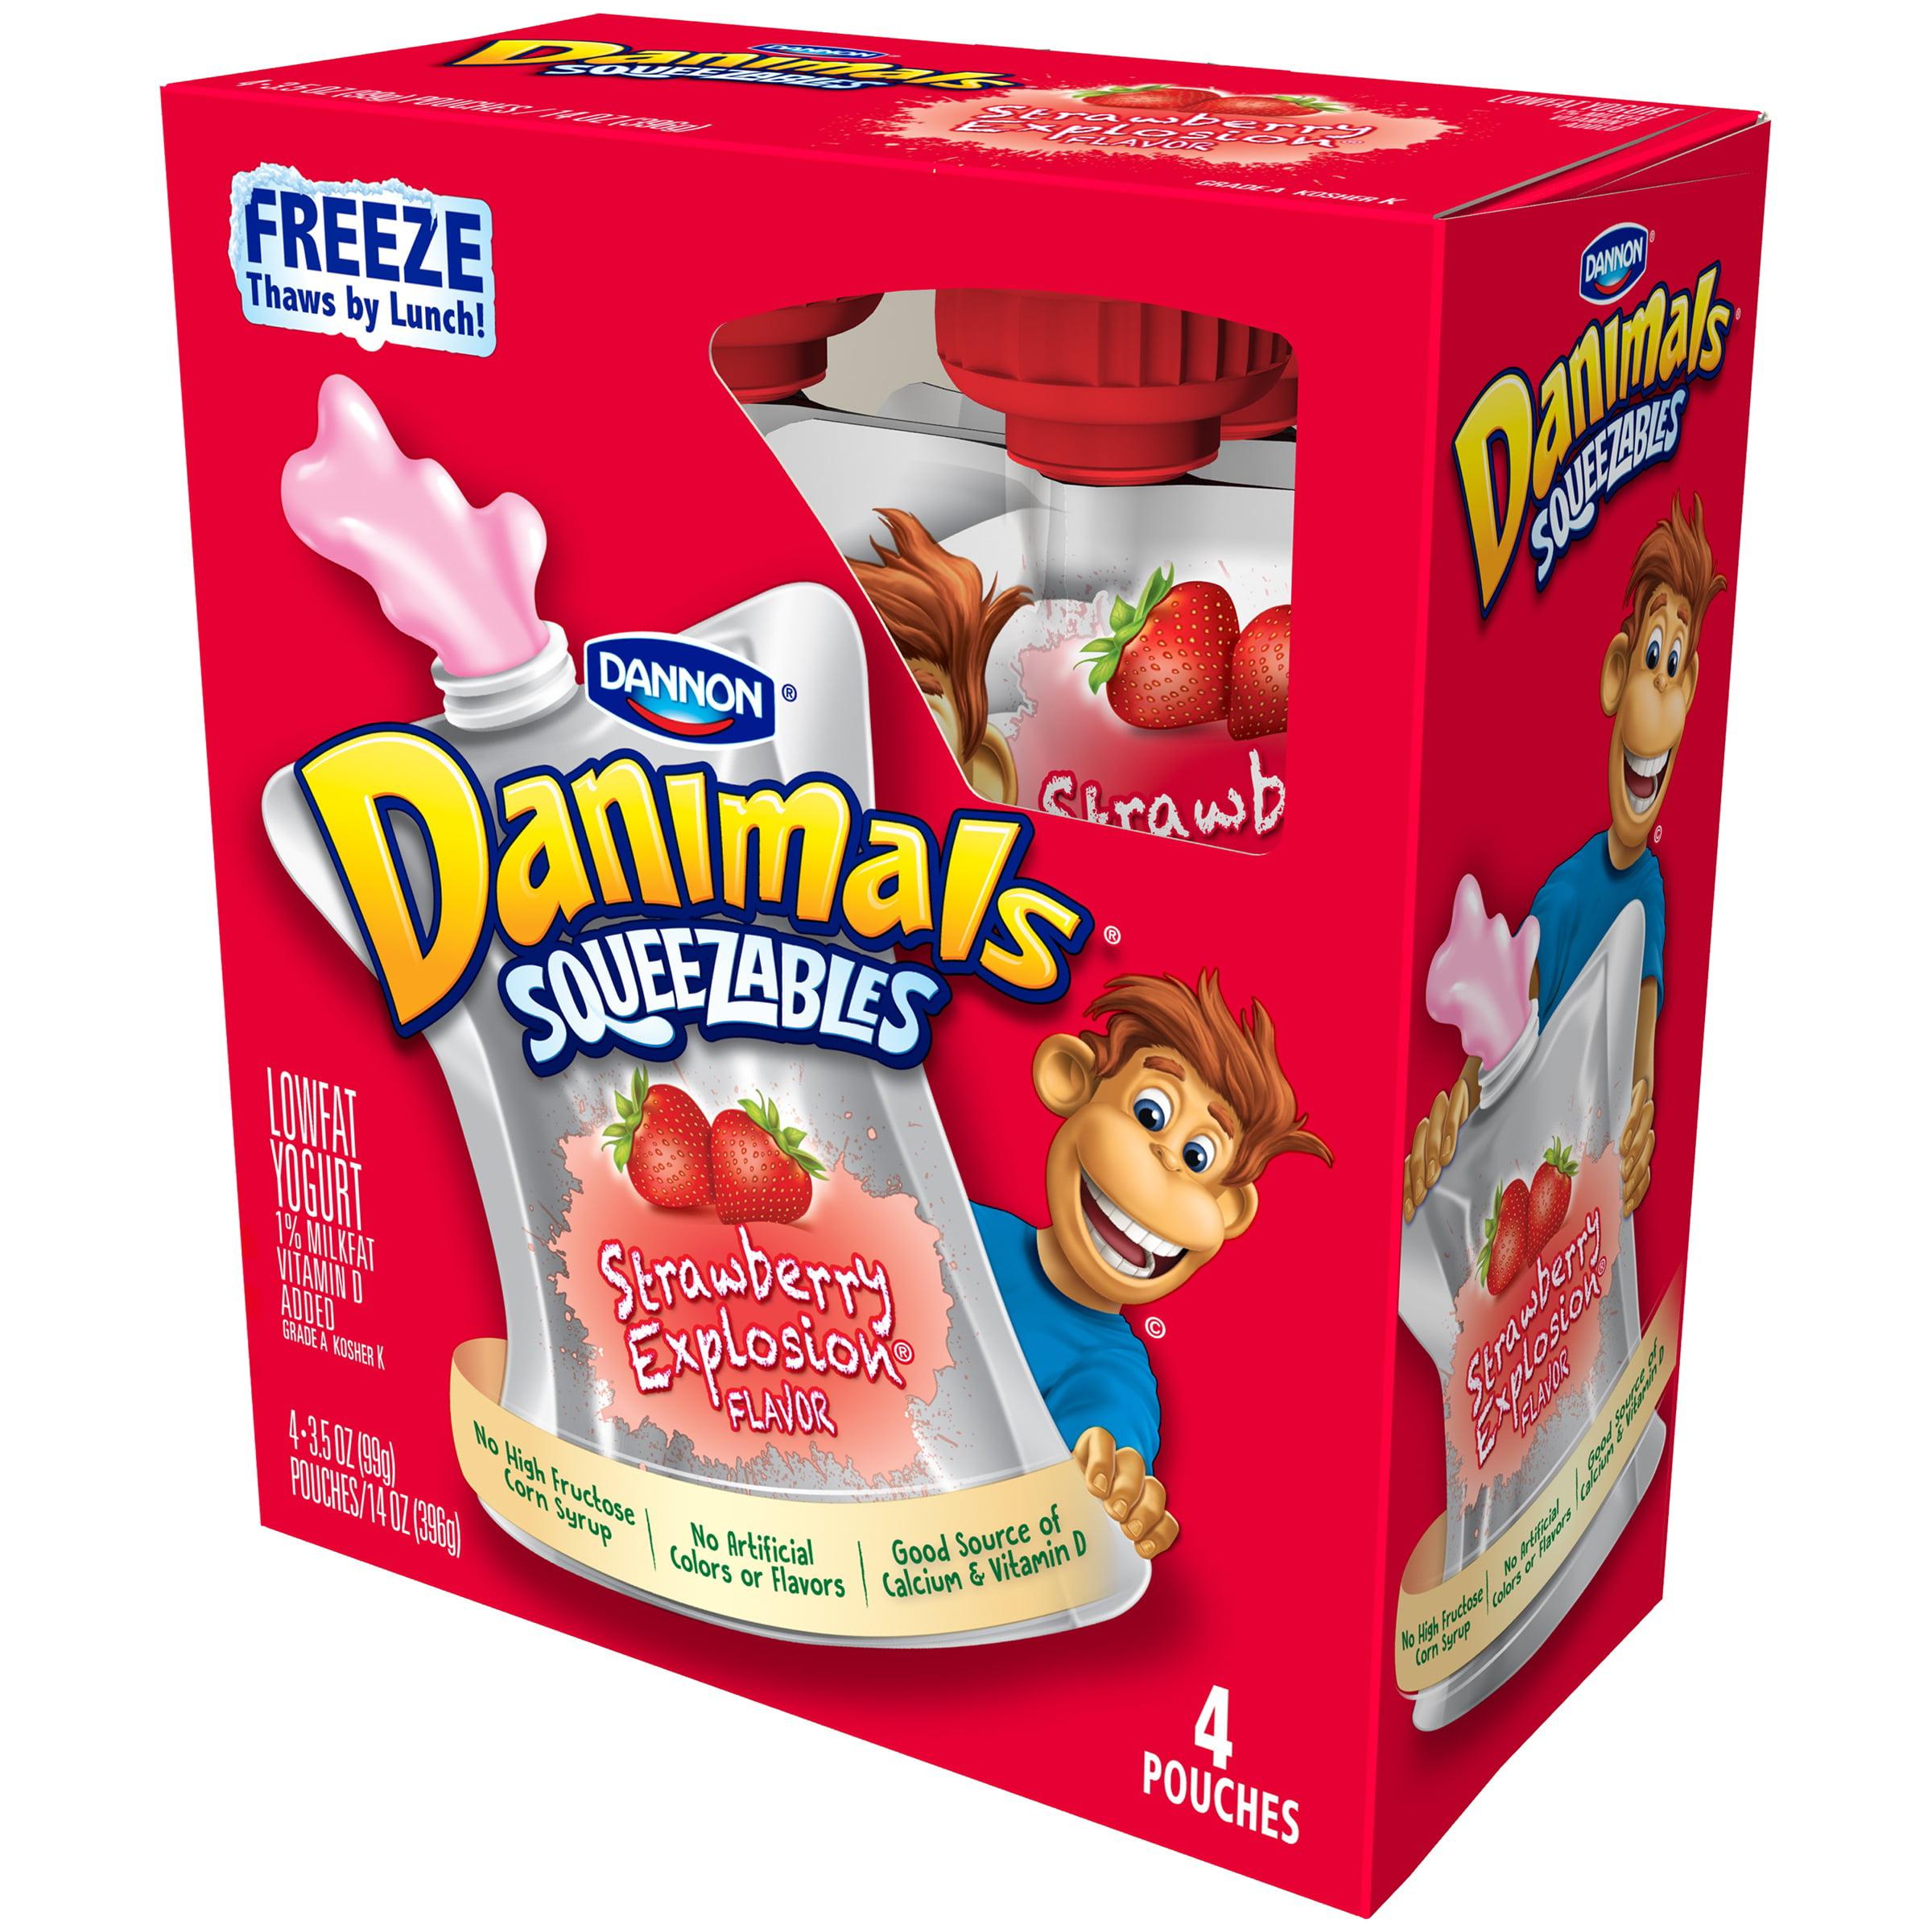 Danimals, Squeezable Strawberry Explosion Lowfat Yogurt, 3.5 Oz., 4 Count